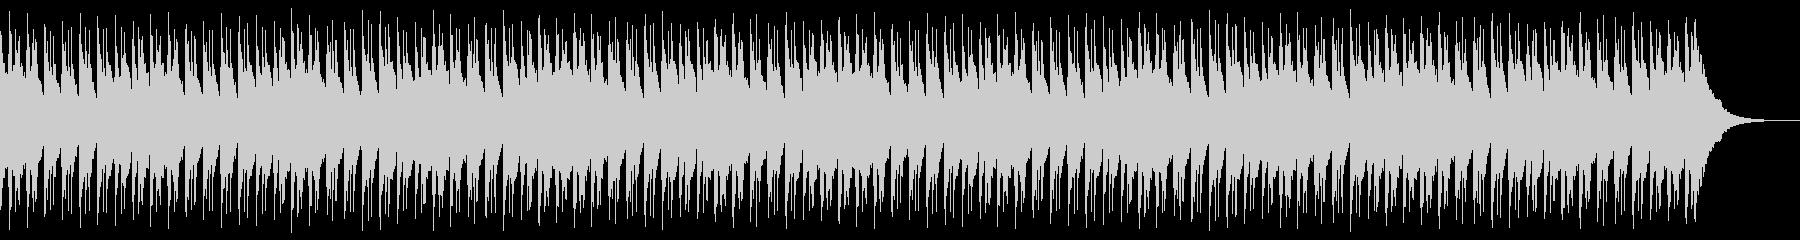 Happy Ukulele 11の未再生の波形